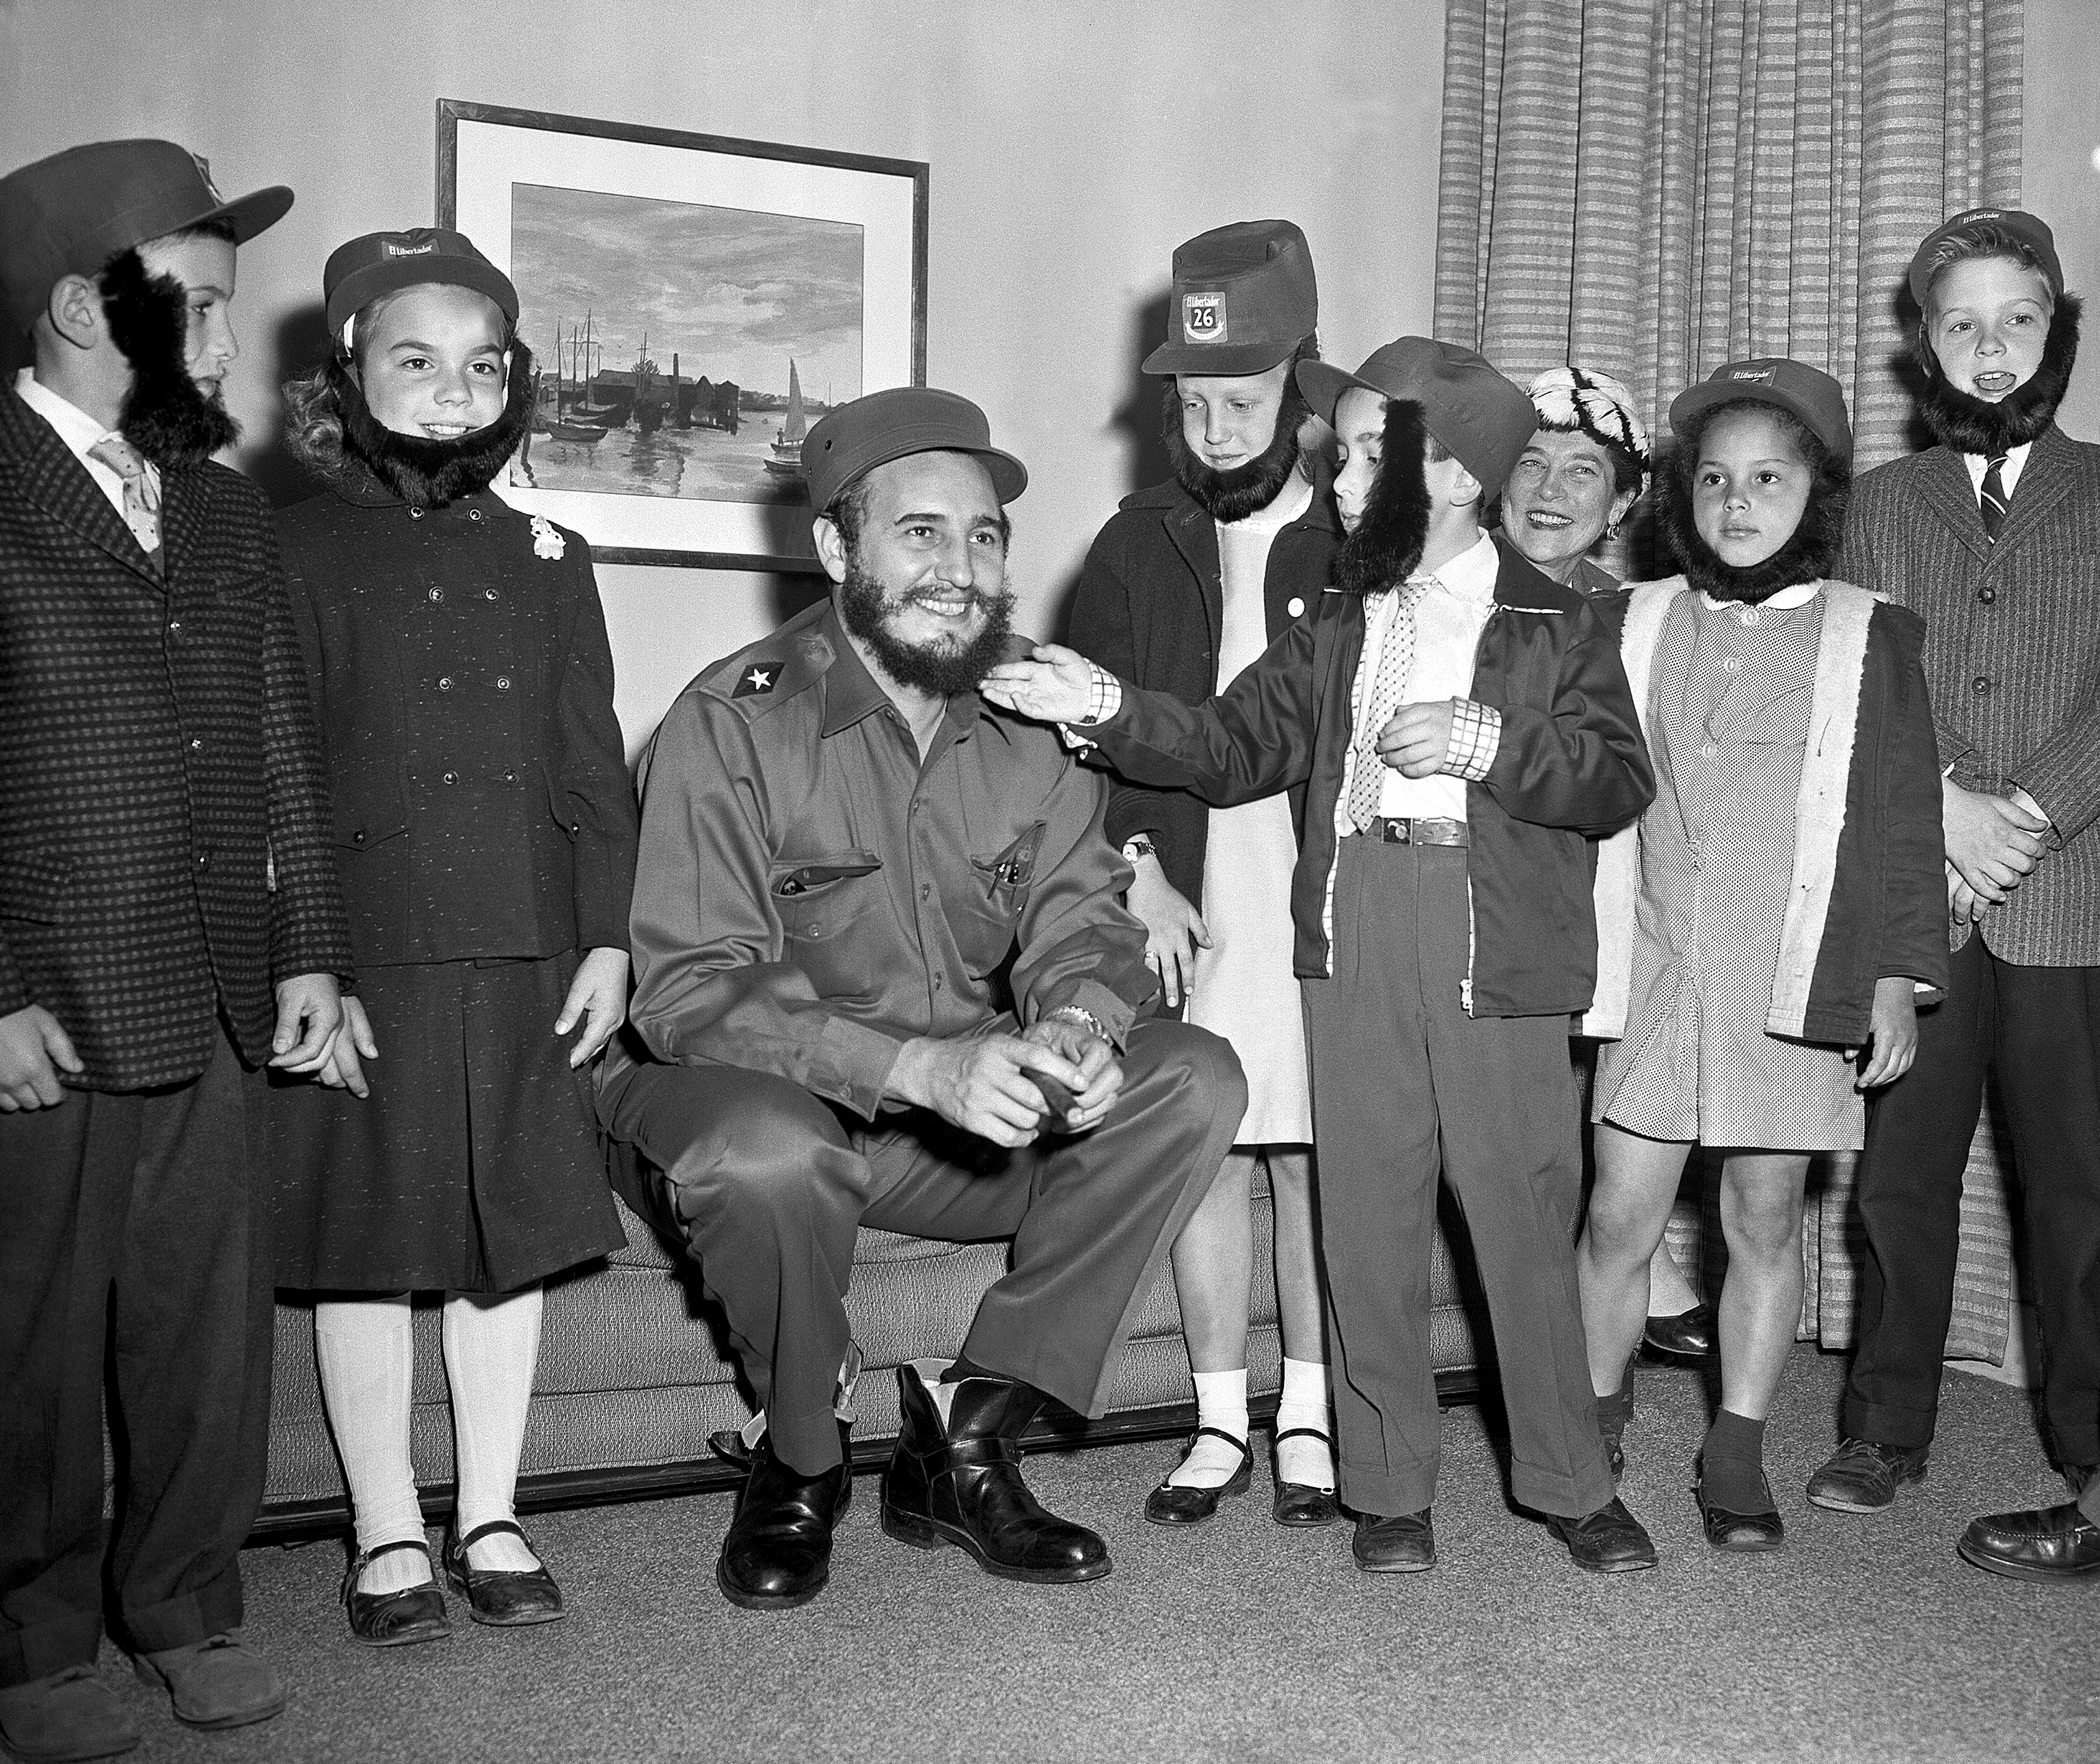 Fidel Castro S Wild New York Visit History In The Headlines